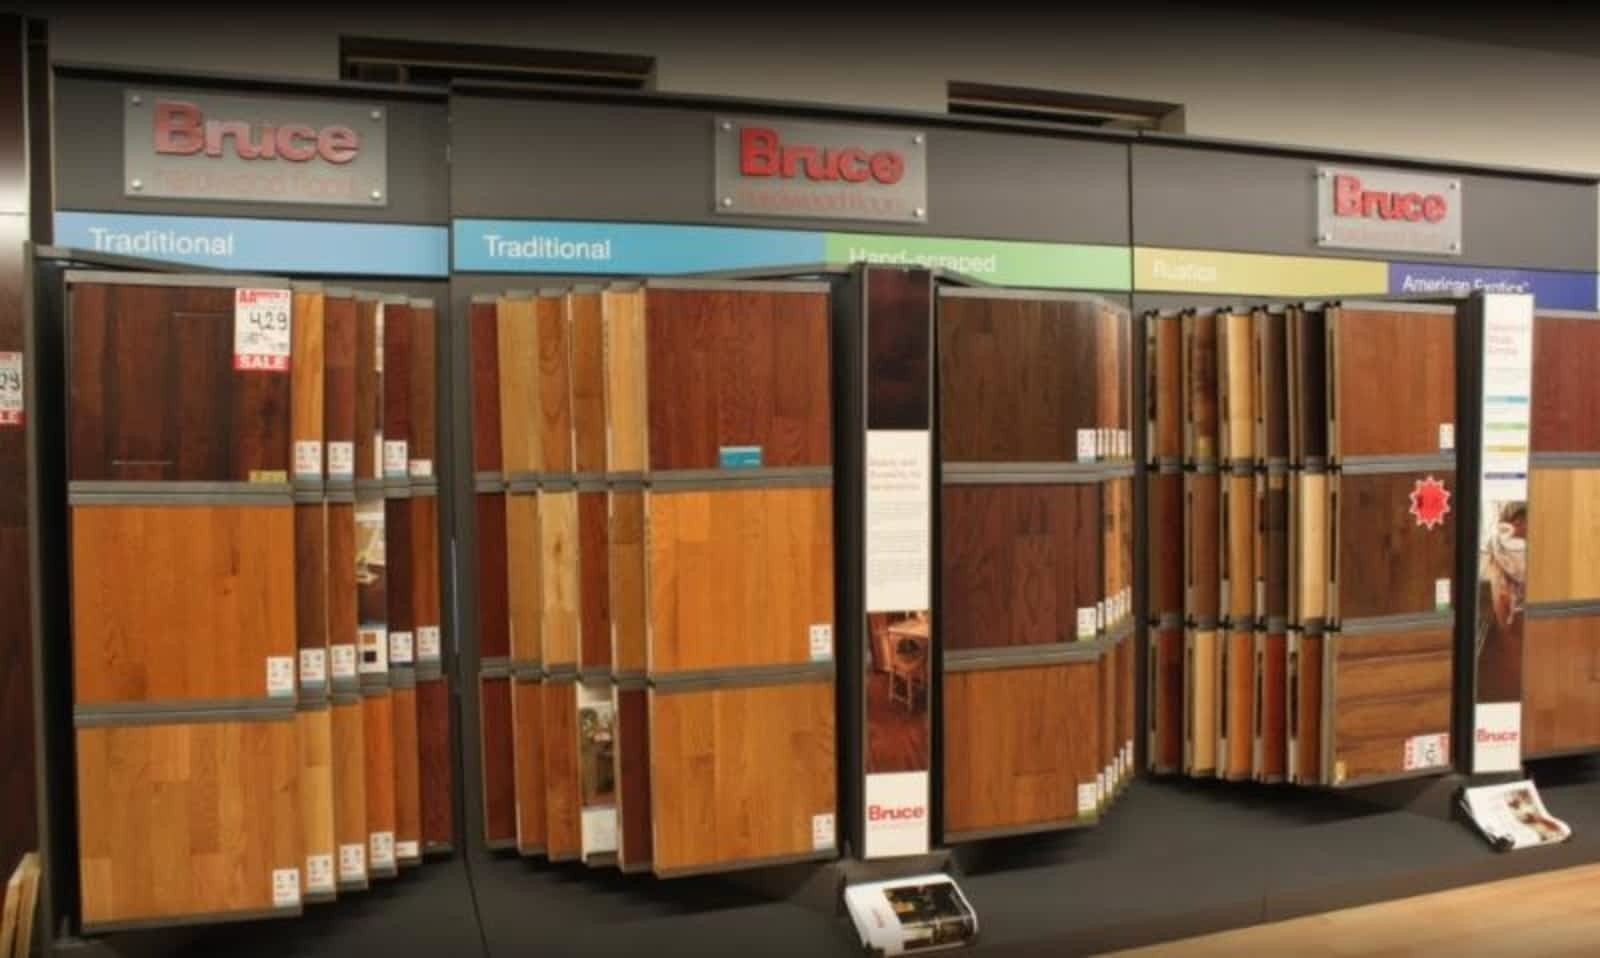 aa hardwood flooring etobicoke of aa floors and more opening hours 524 evans ave etobicoke on throughout aa floors and more 6